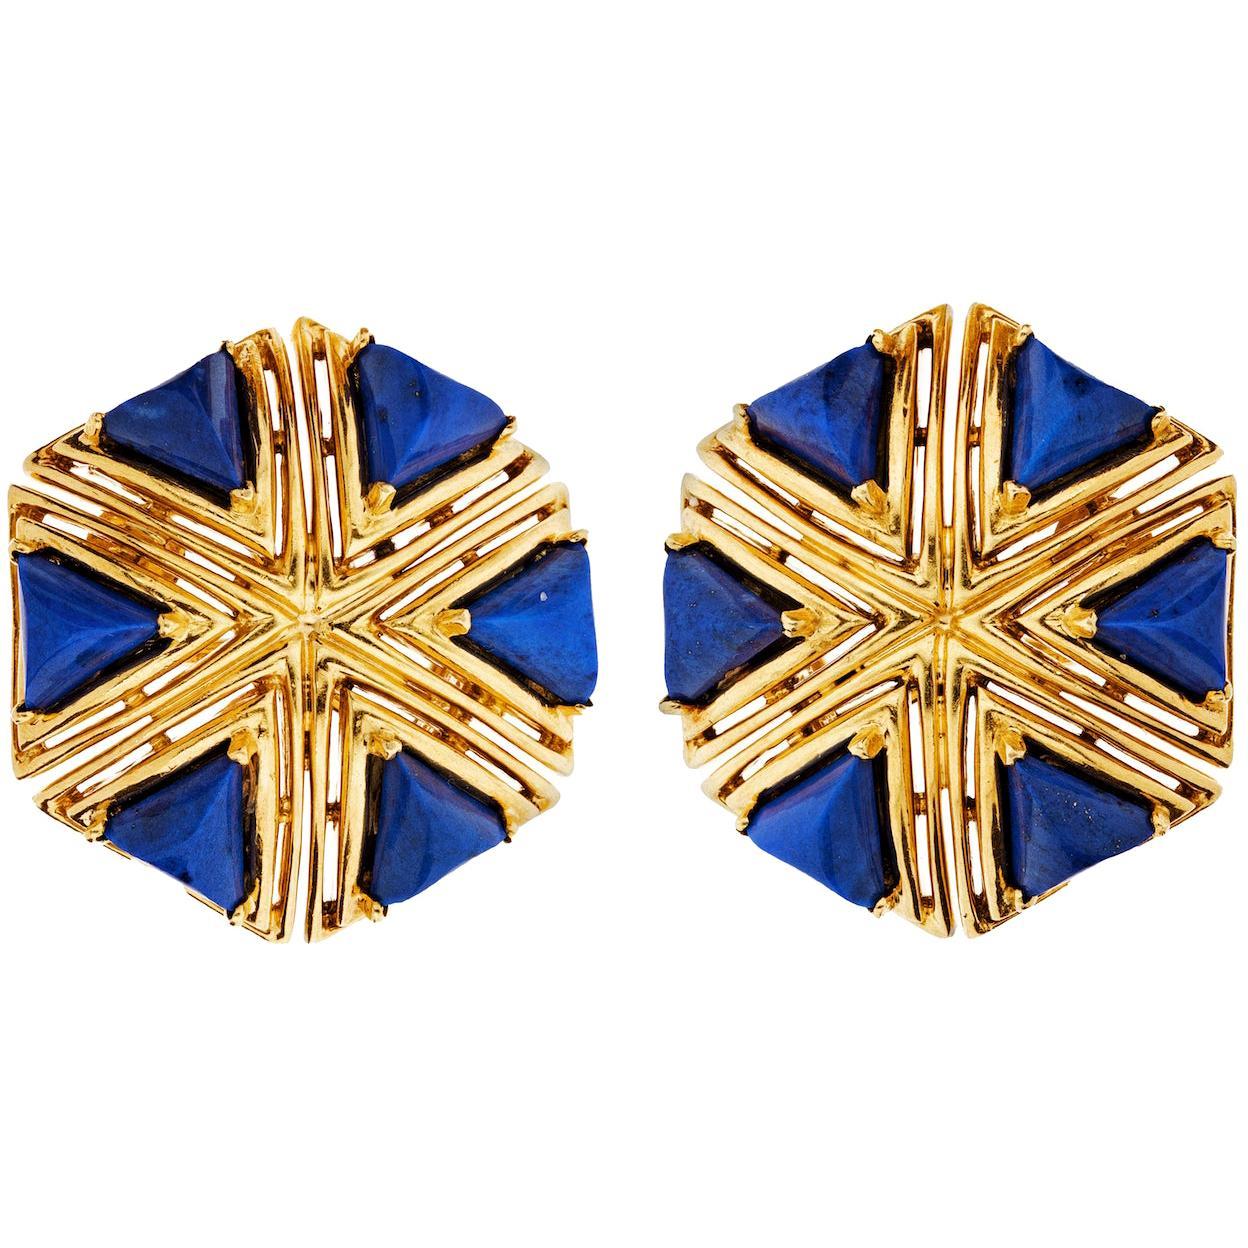 Tiffany & Co. Blue Lapis Gold Vintage Eclectic Bohemian 1970s Earrings